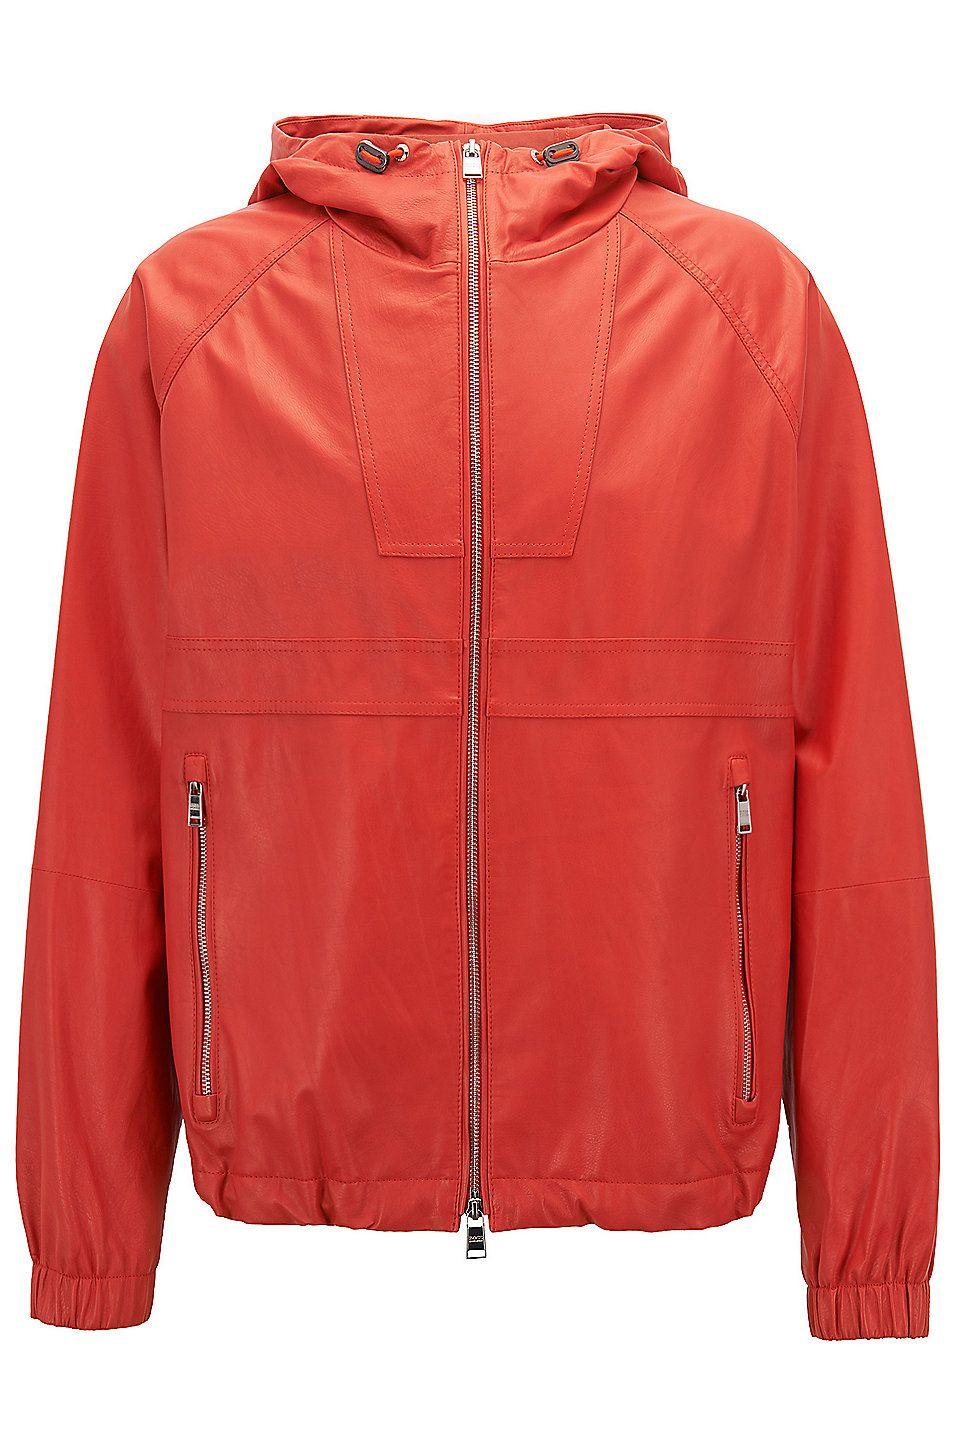 Lightweight Nappa Leather Windbreaker Jacket Carbello Orange Leather From Boss For Men For Leather Jacket Men Windbreaker Jacket Orange Leather Jacket [ 1456 x 960 Pixel ]